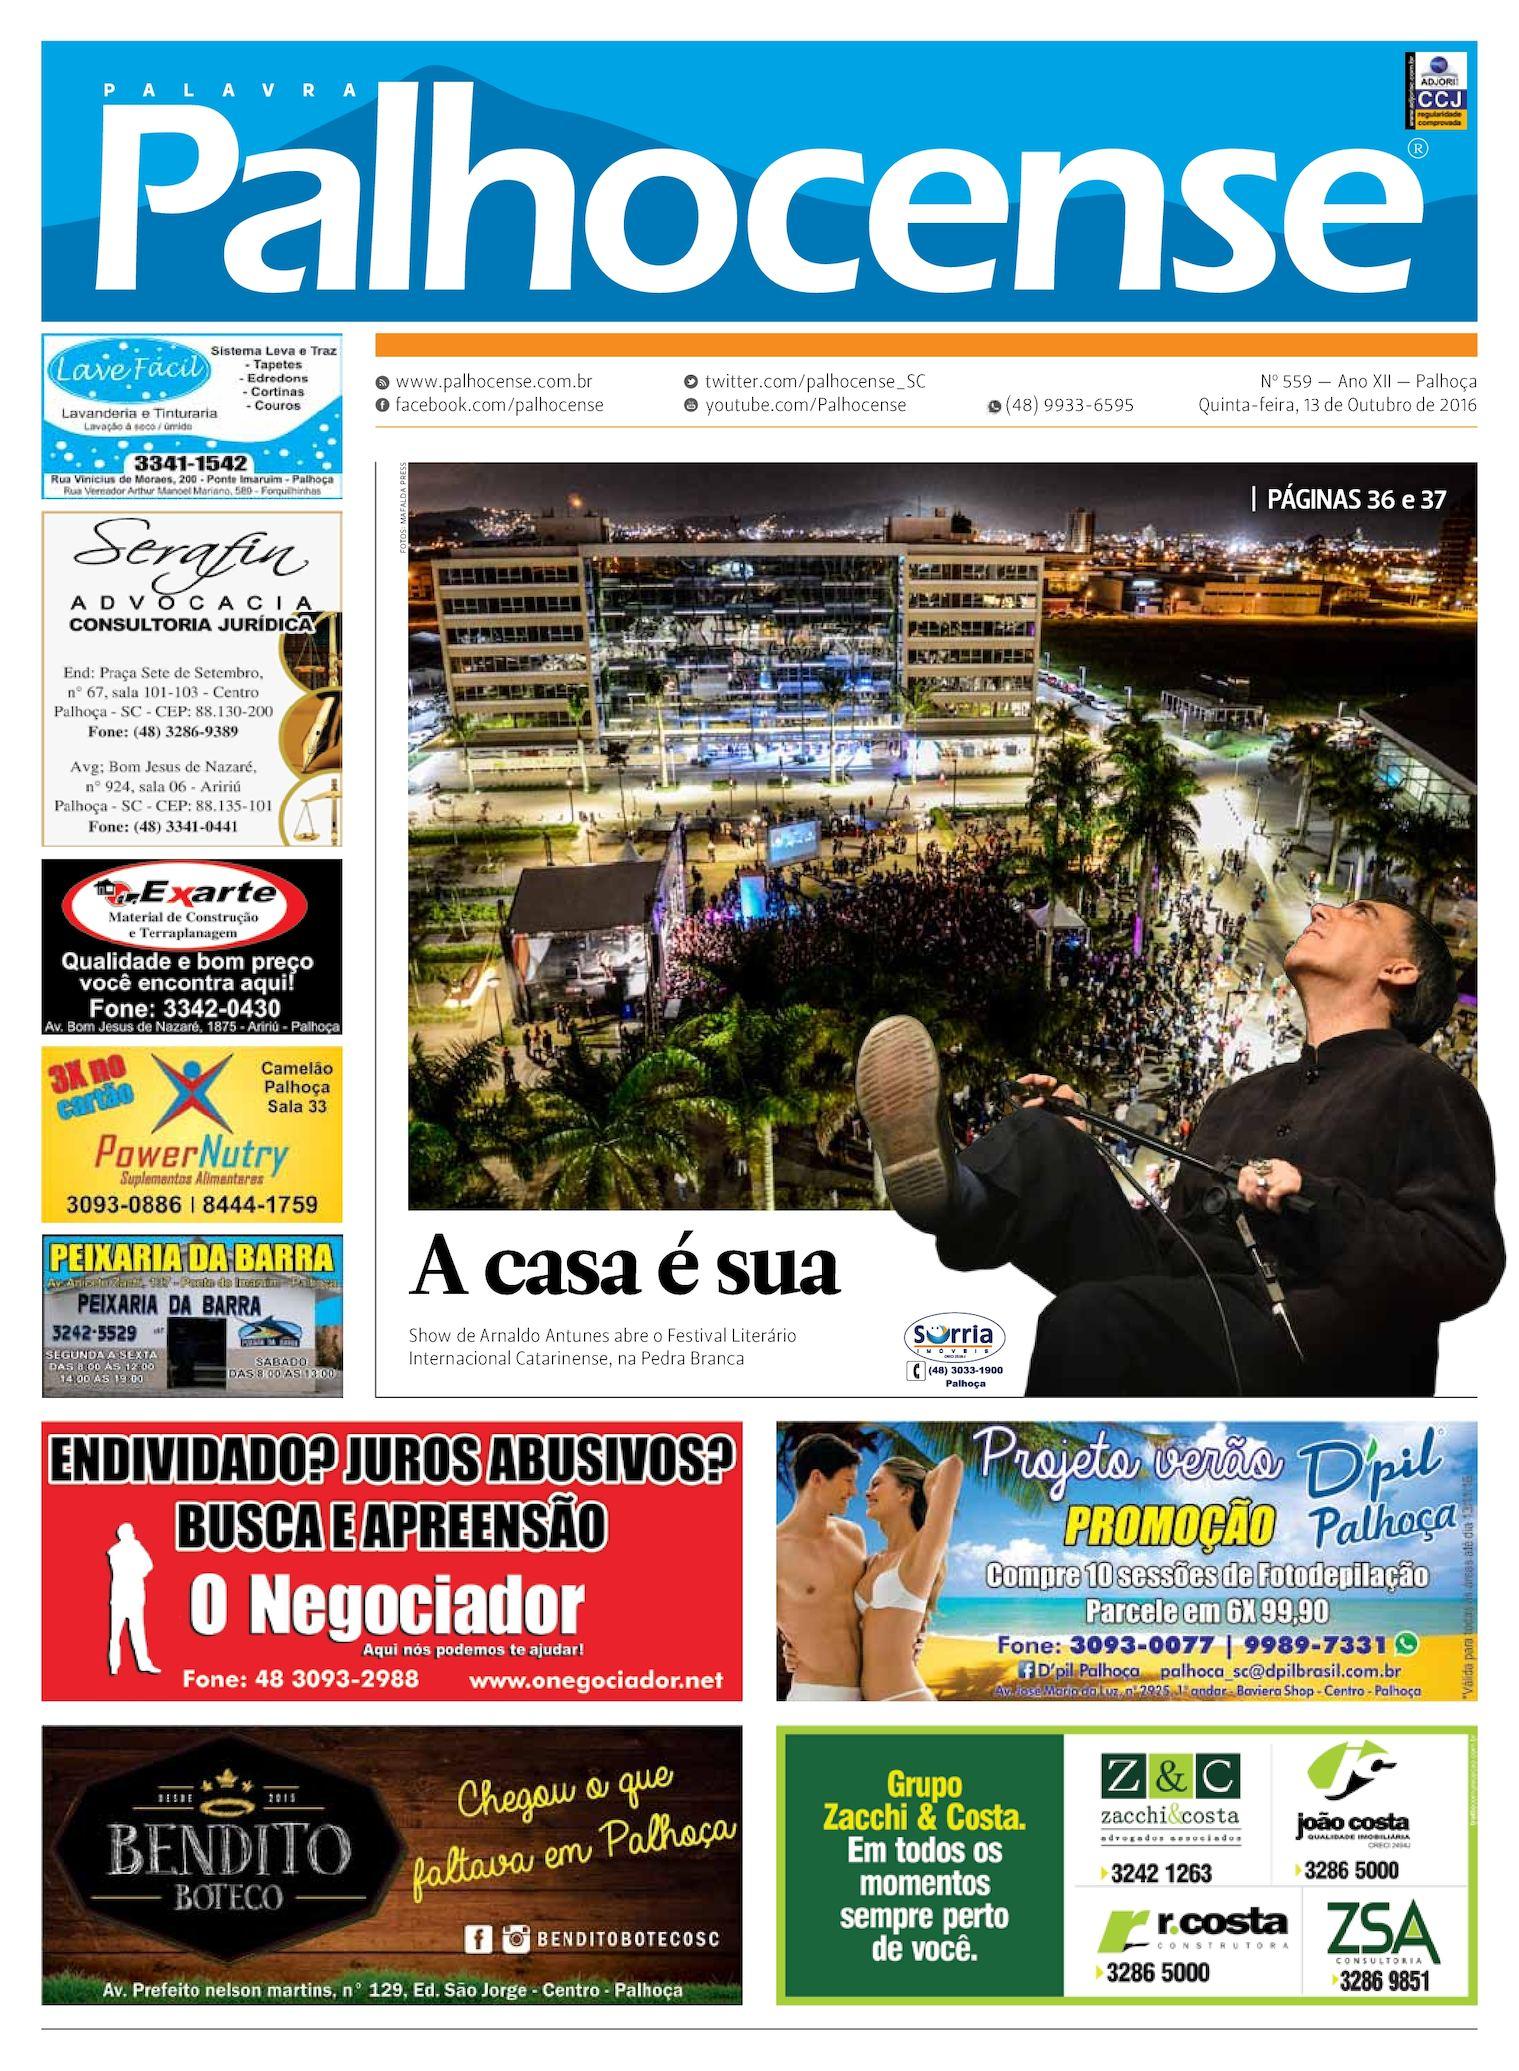 Calaméo - Jornal Palavra Palhocense - EDIÇÃO 559 885a6906cf482